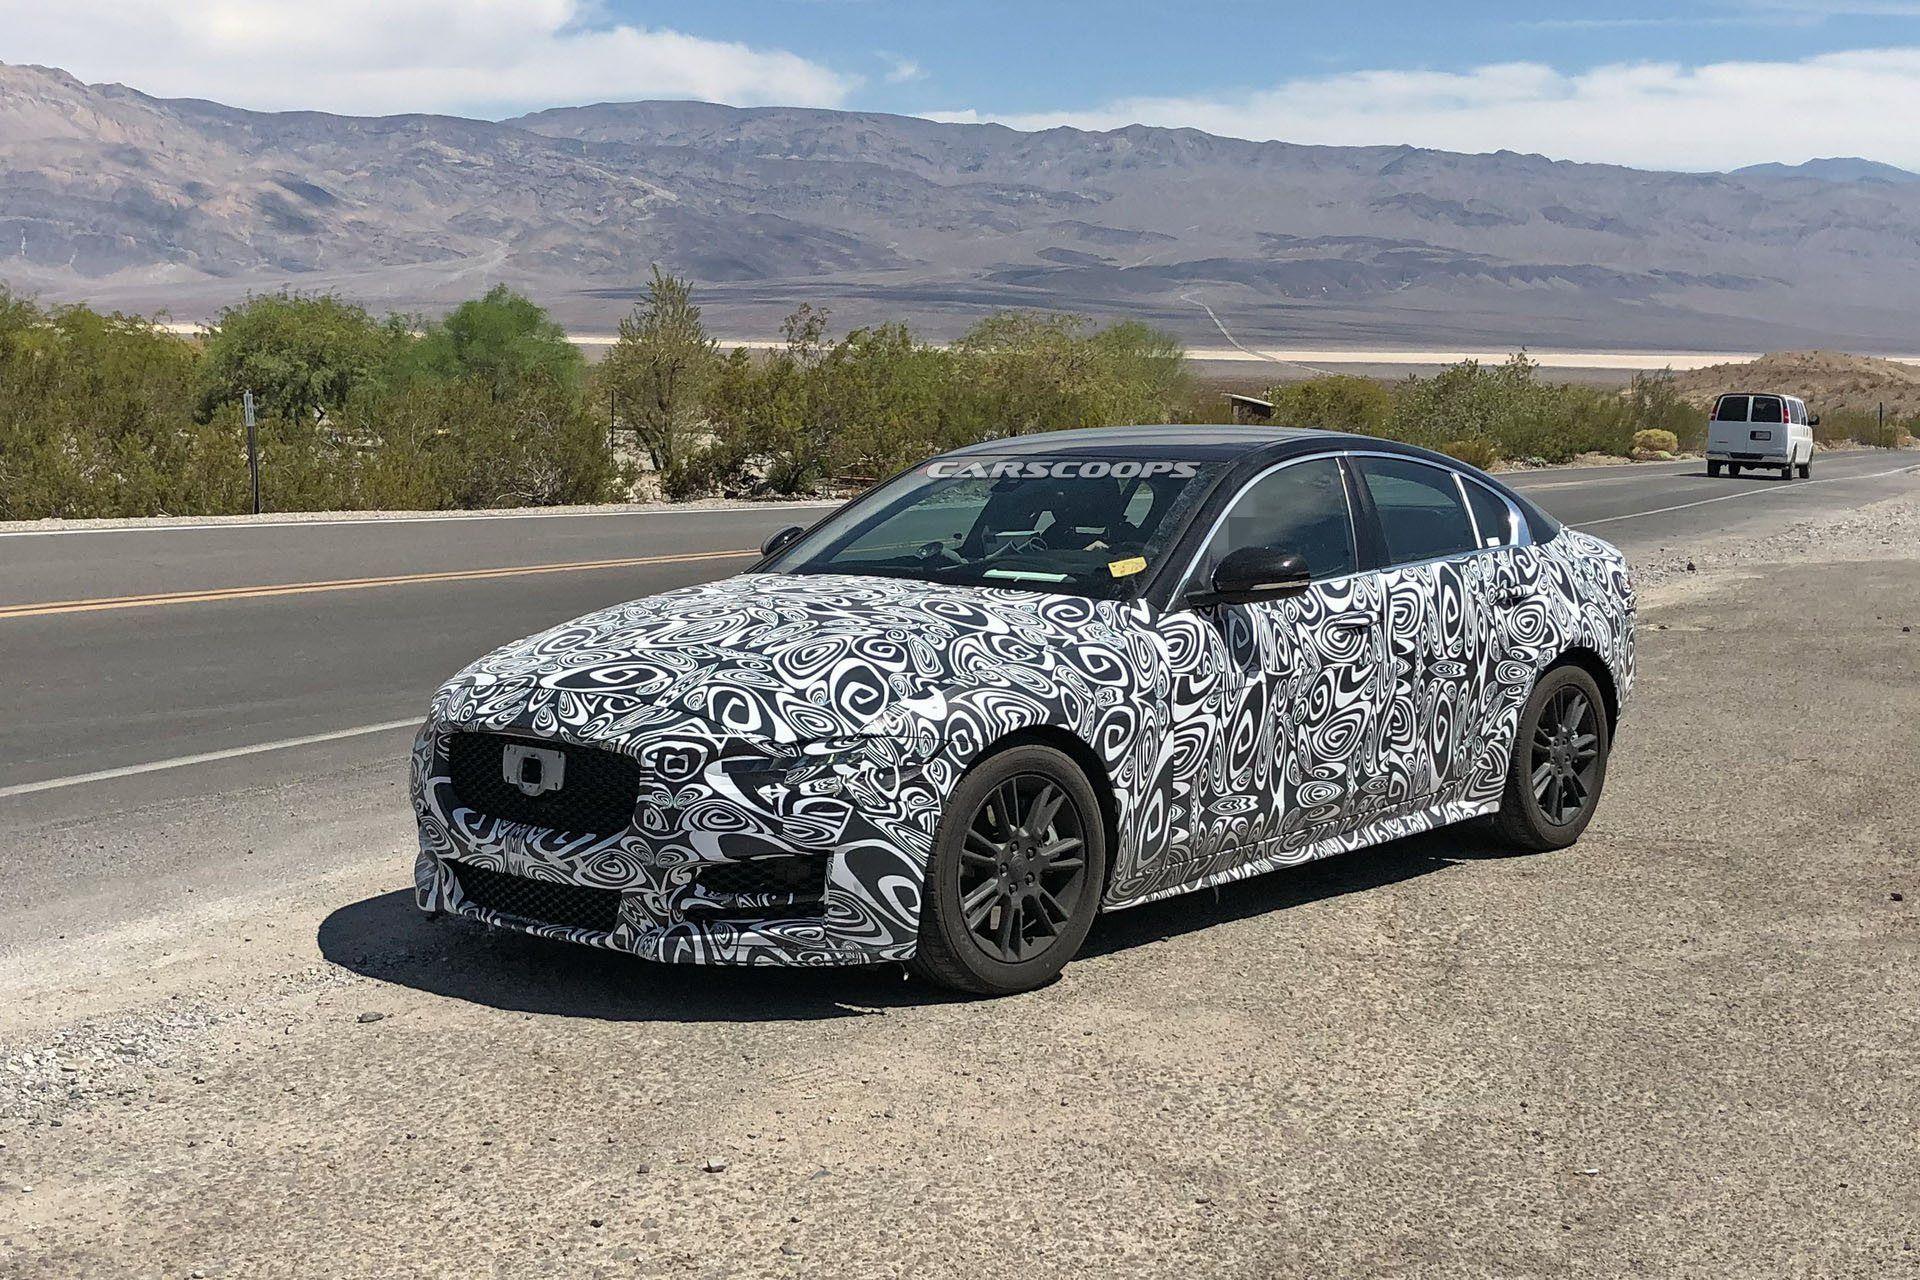 2021 Chrysler 200 Spy Shoot in 2020 Jaguar xe, Jaguar xf